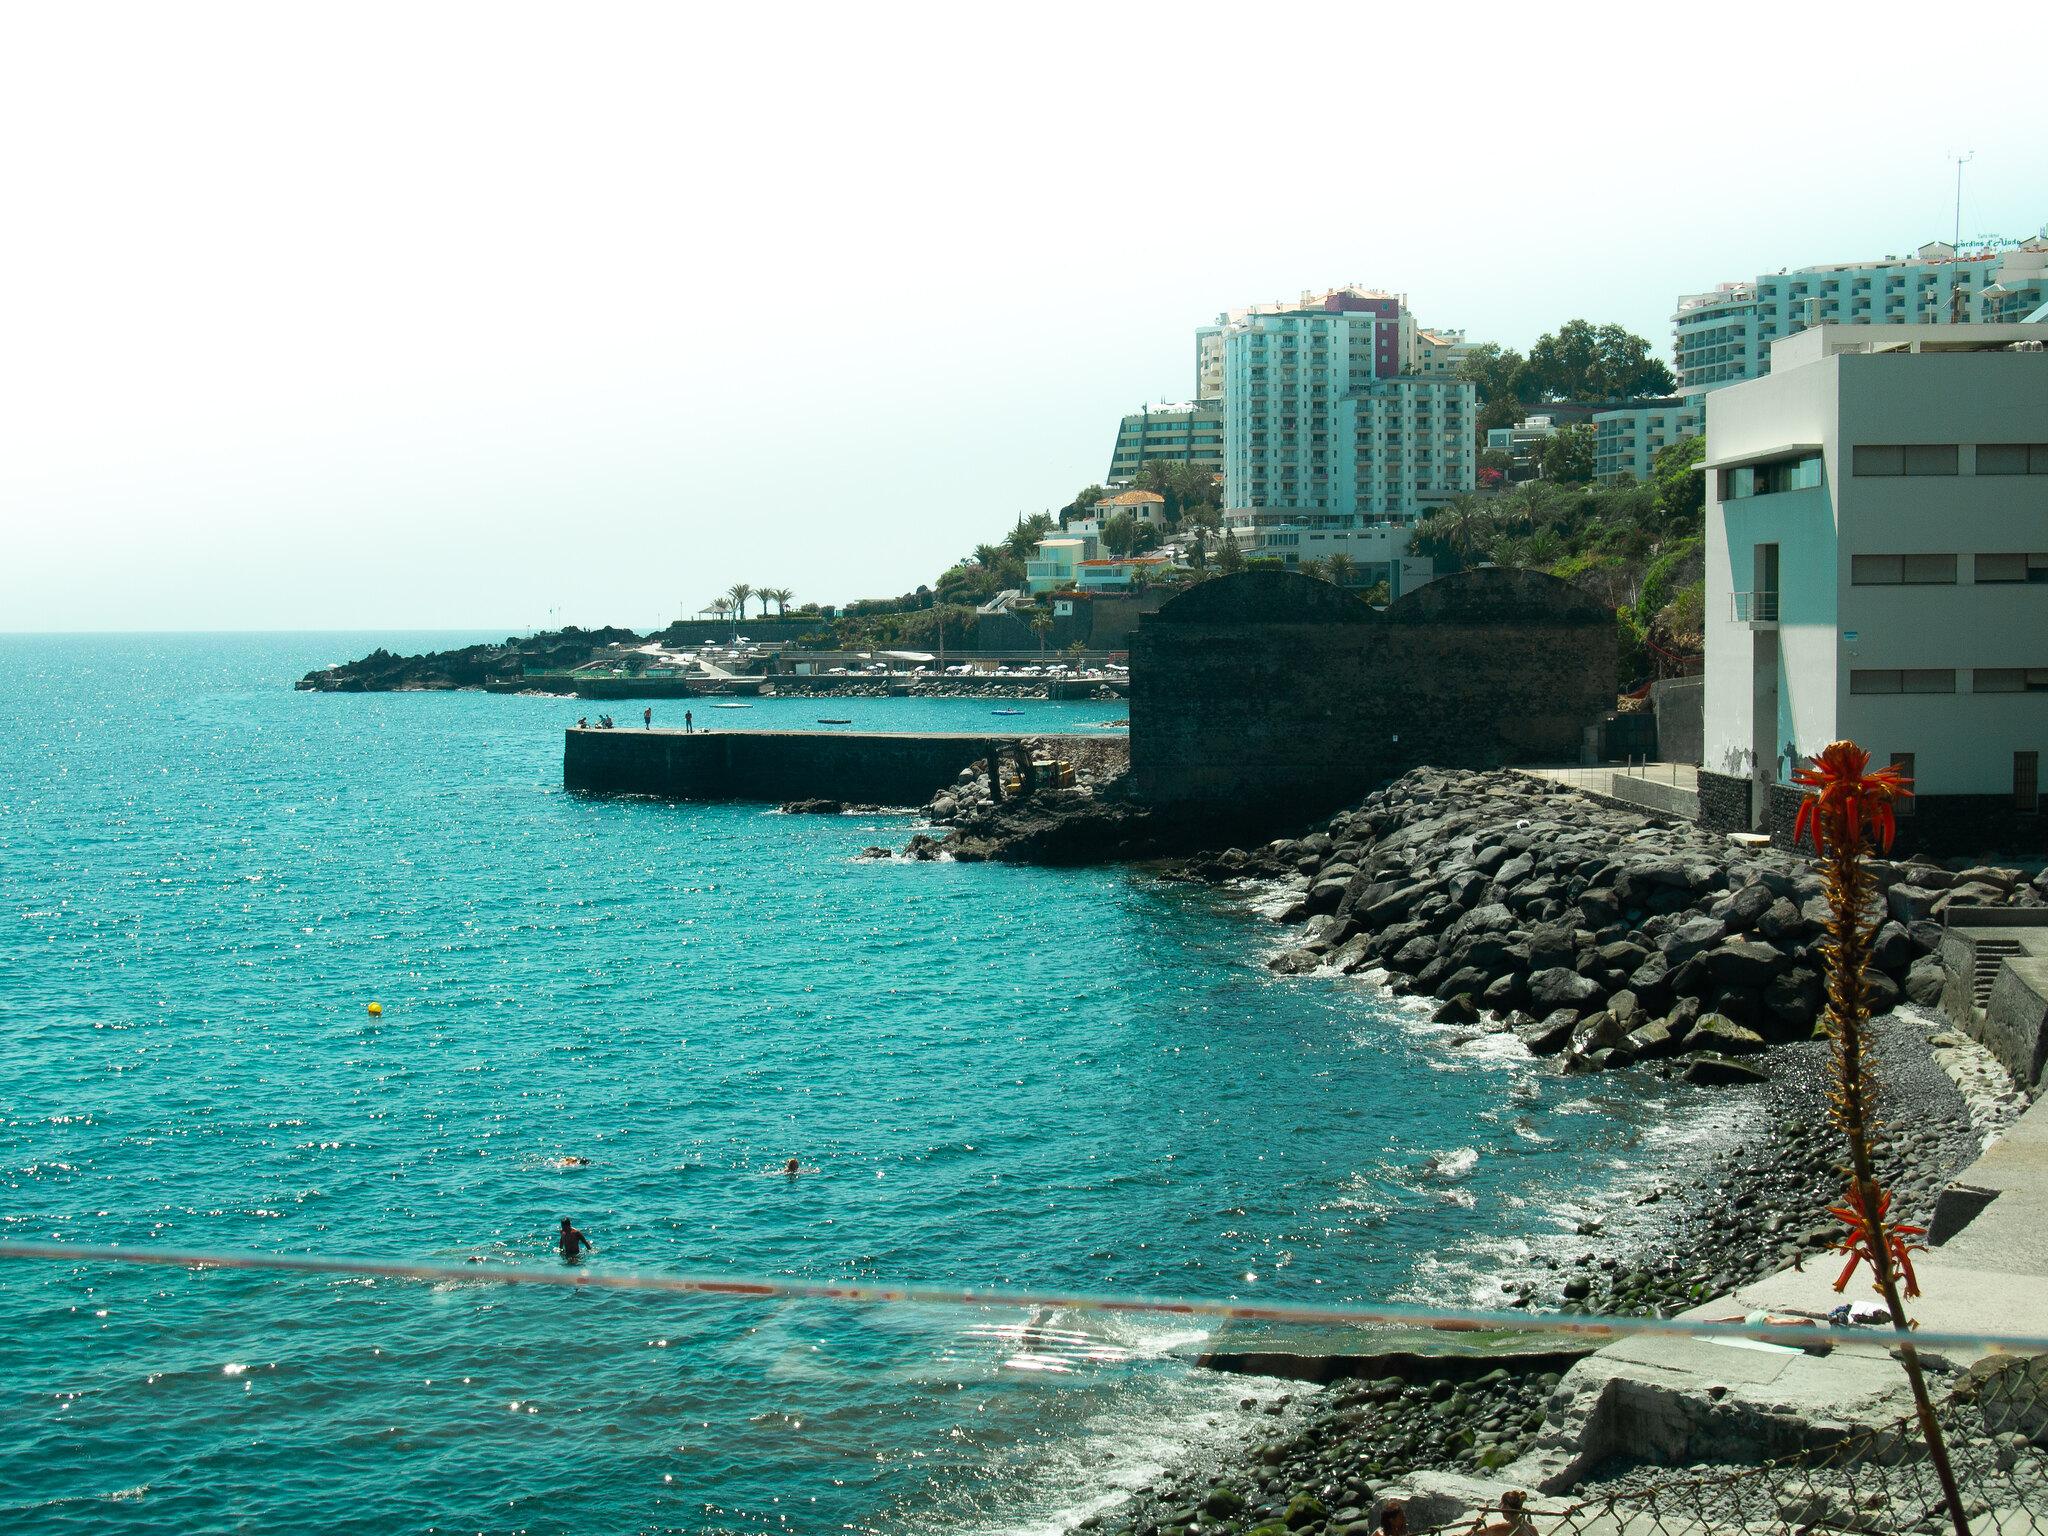 Madeira_restaurant_annukka_vuorela3